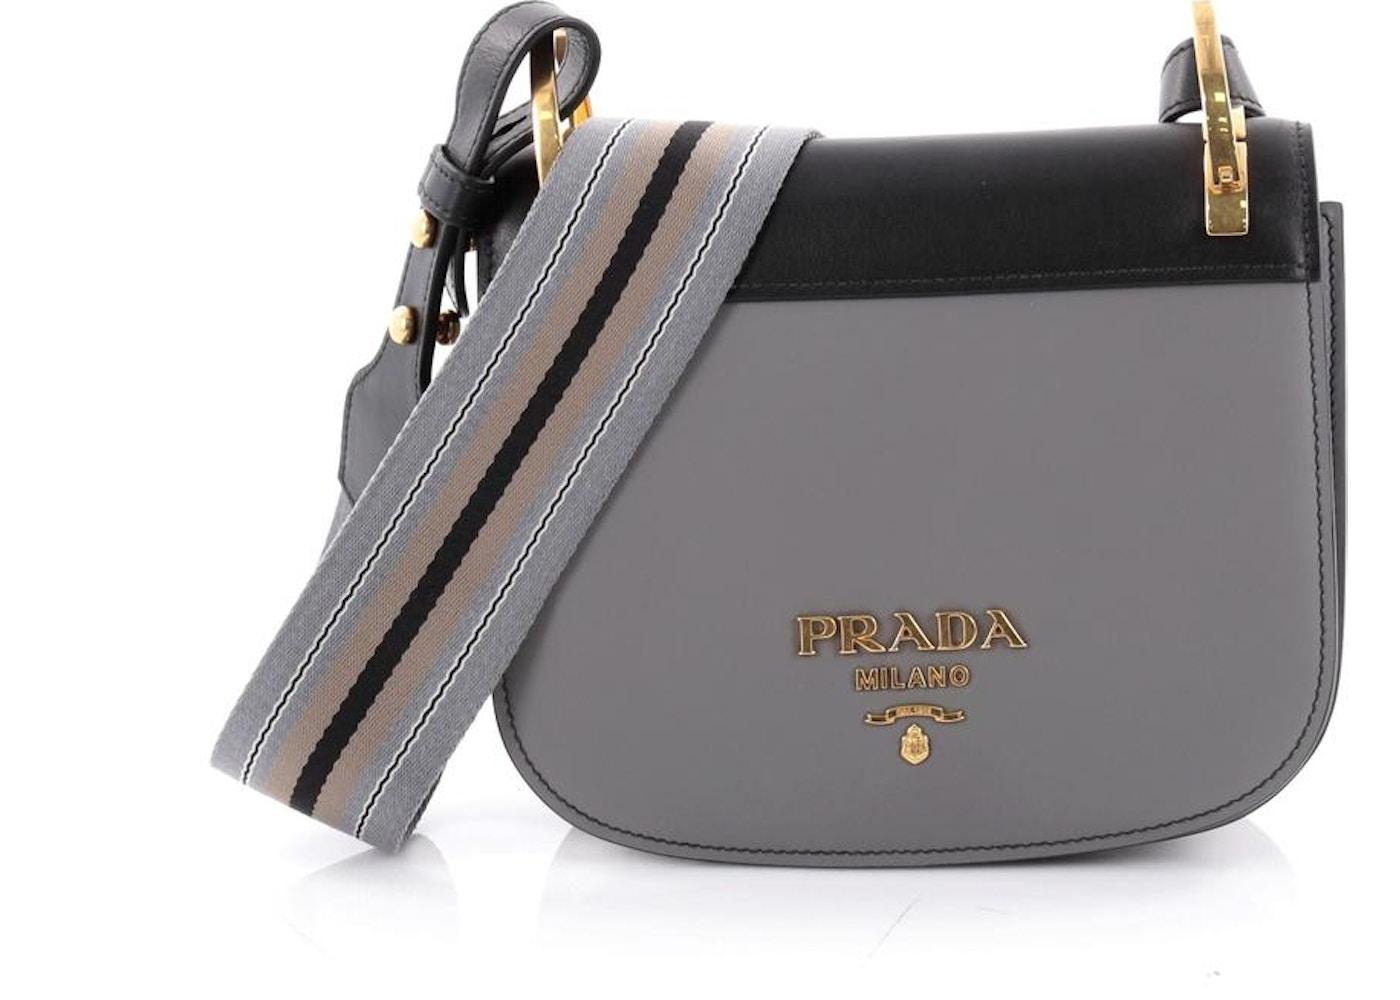 34d7156198ed Prada Pionniere Saddle Bag Small Gray Black. Small Gray Black